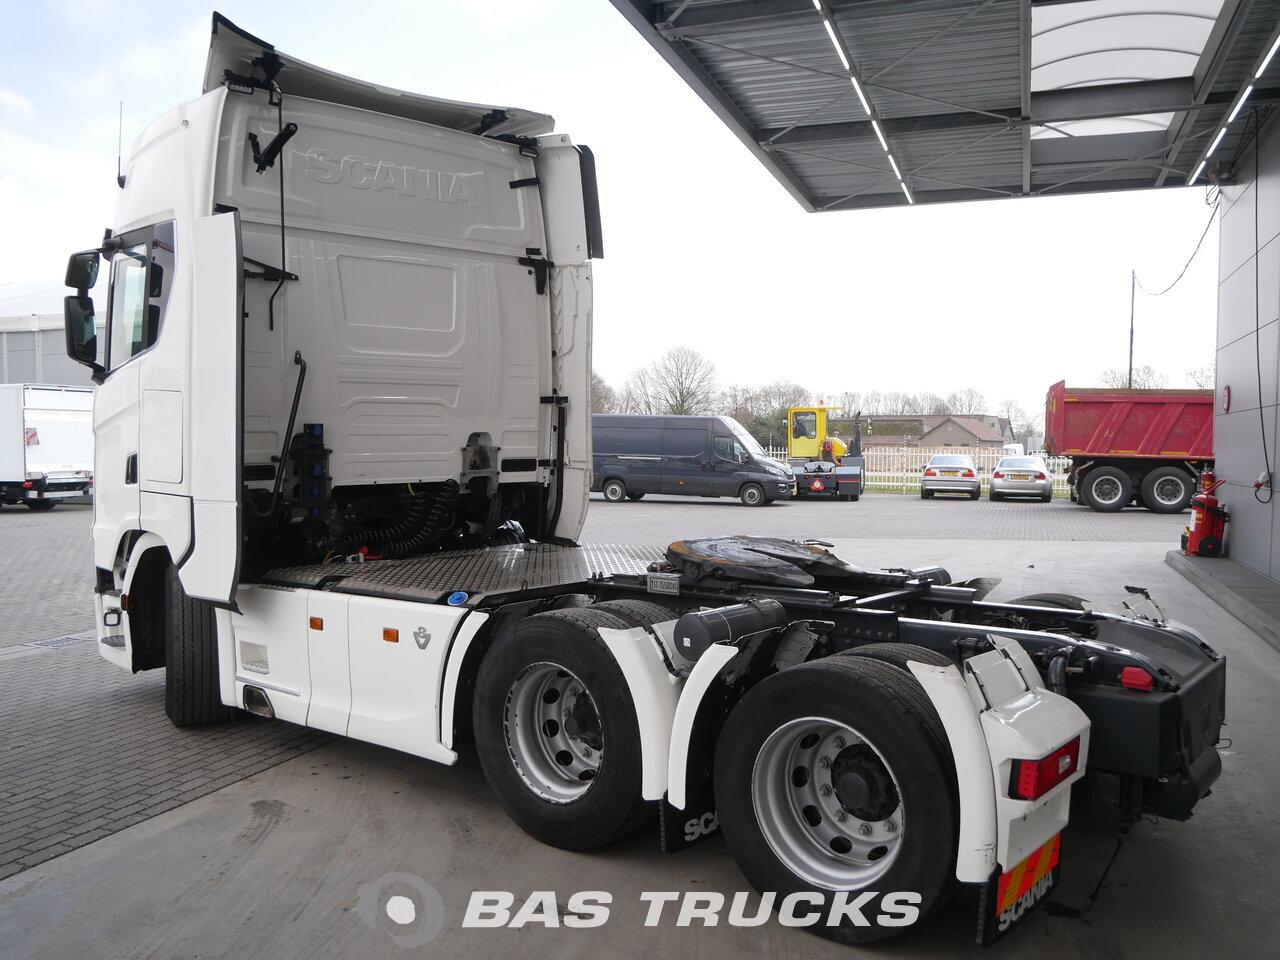 scania s520 v8 unfall fahrbahr tracteur euro 6 71800 bas trucks. Black Bedroom Furniture Sets. Home Design Ideas